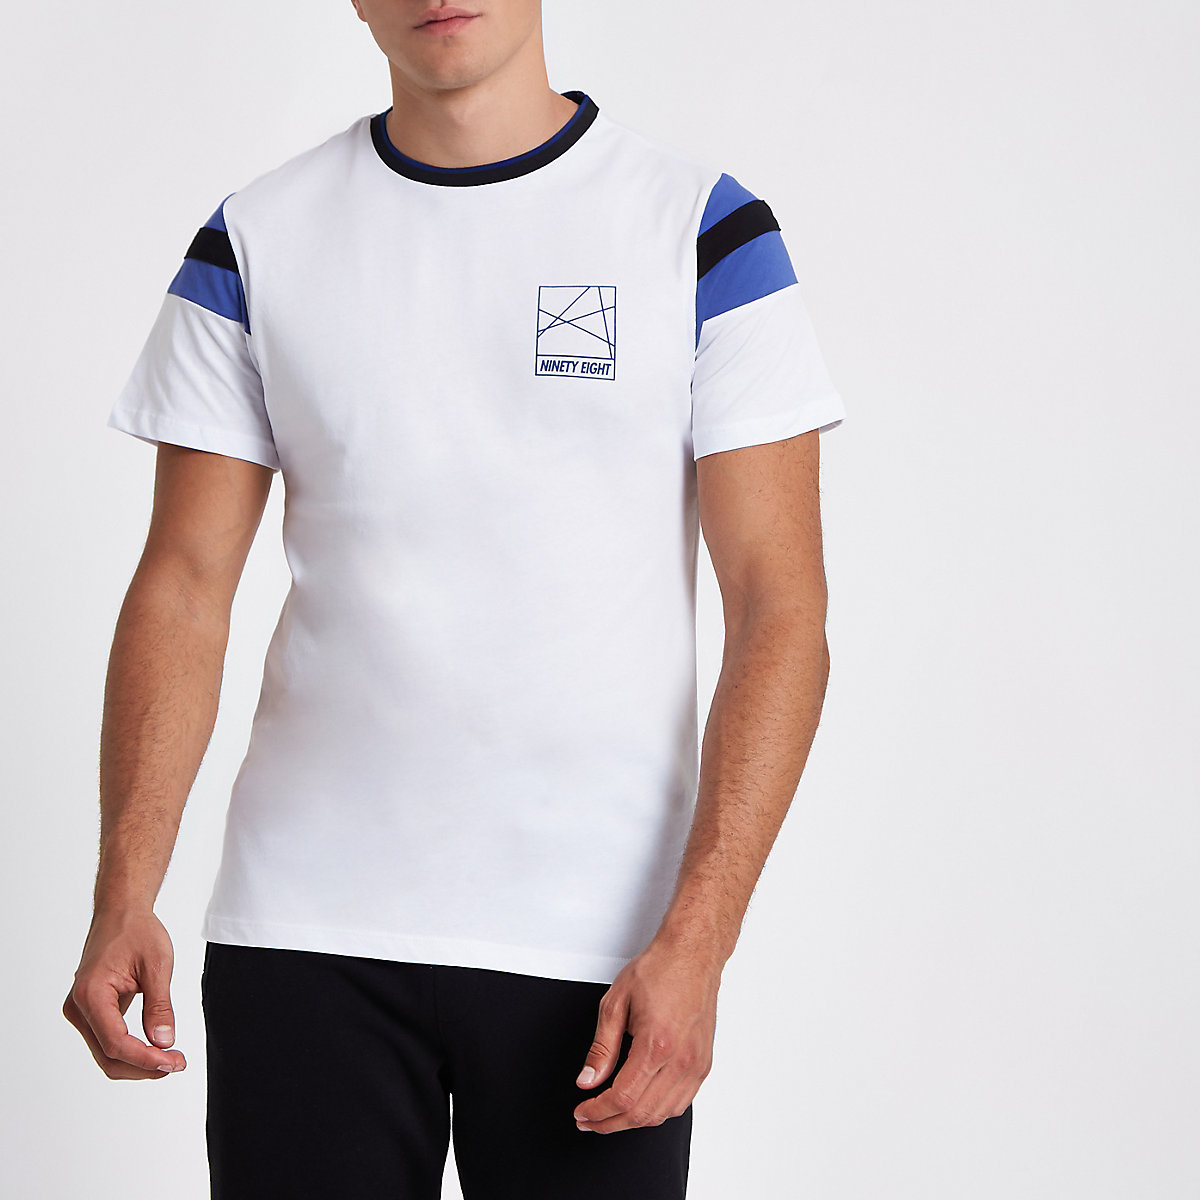 White 'Ninety eight' slim fit T-shirt